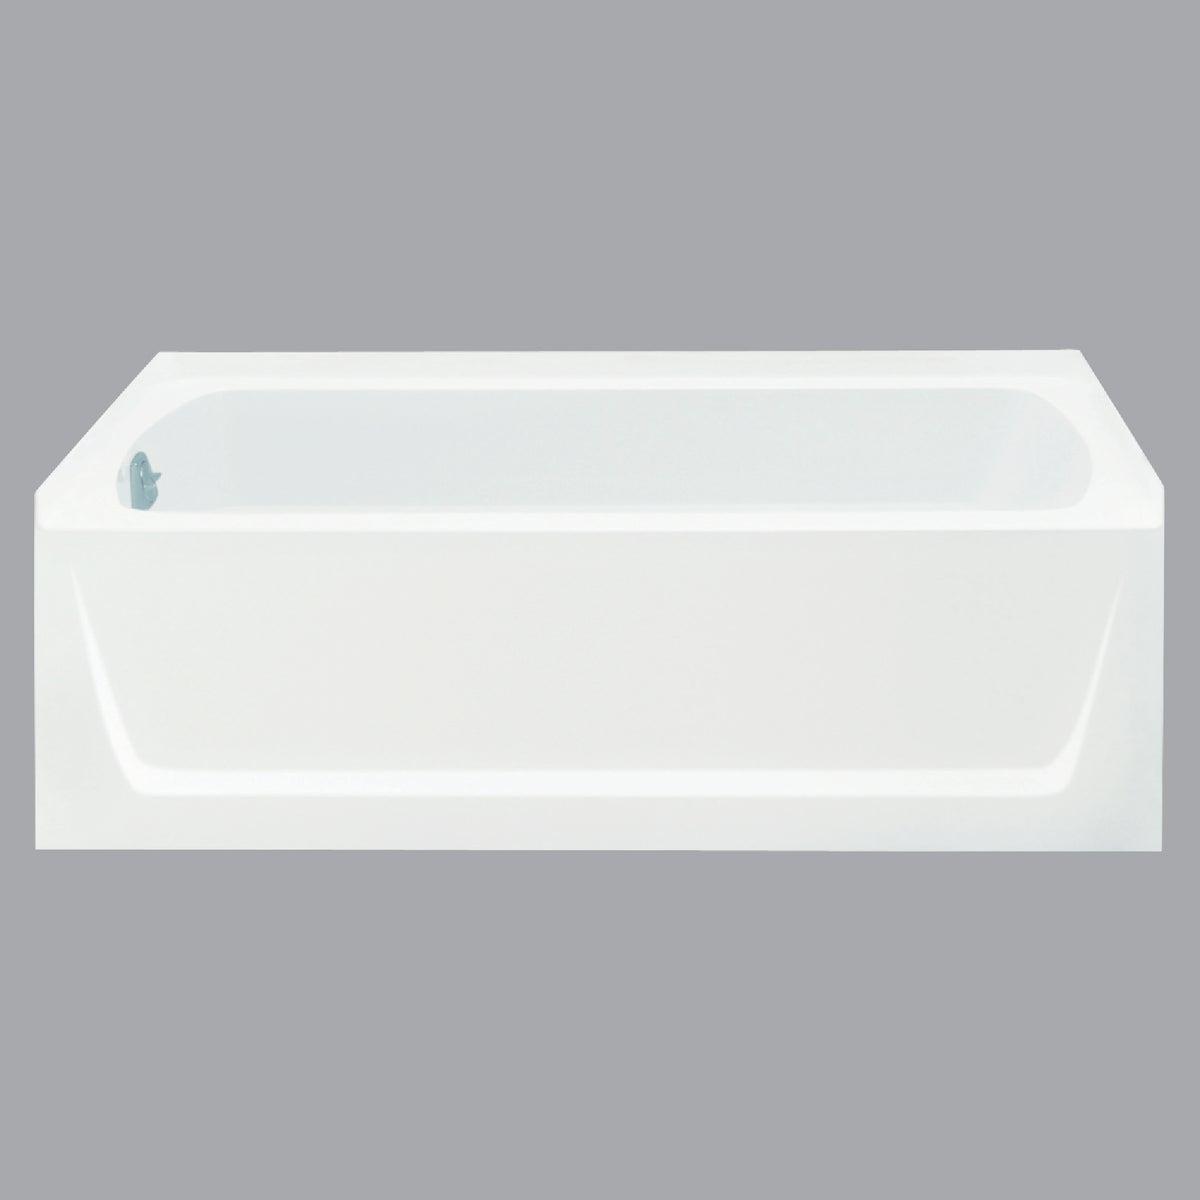 Sterling Vikrell WHITE ENSEMBLE LH TUB 71121110-0